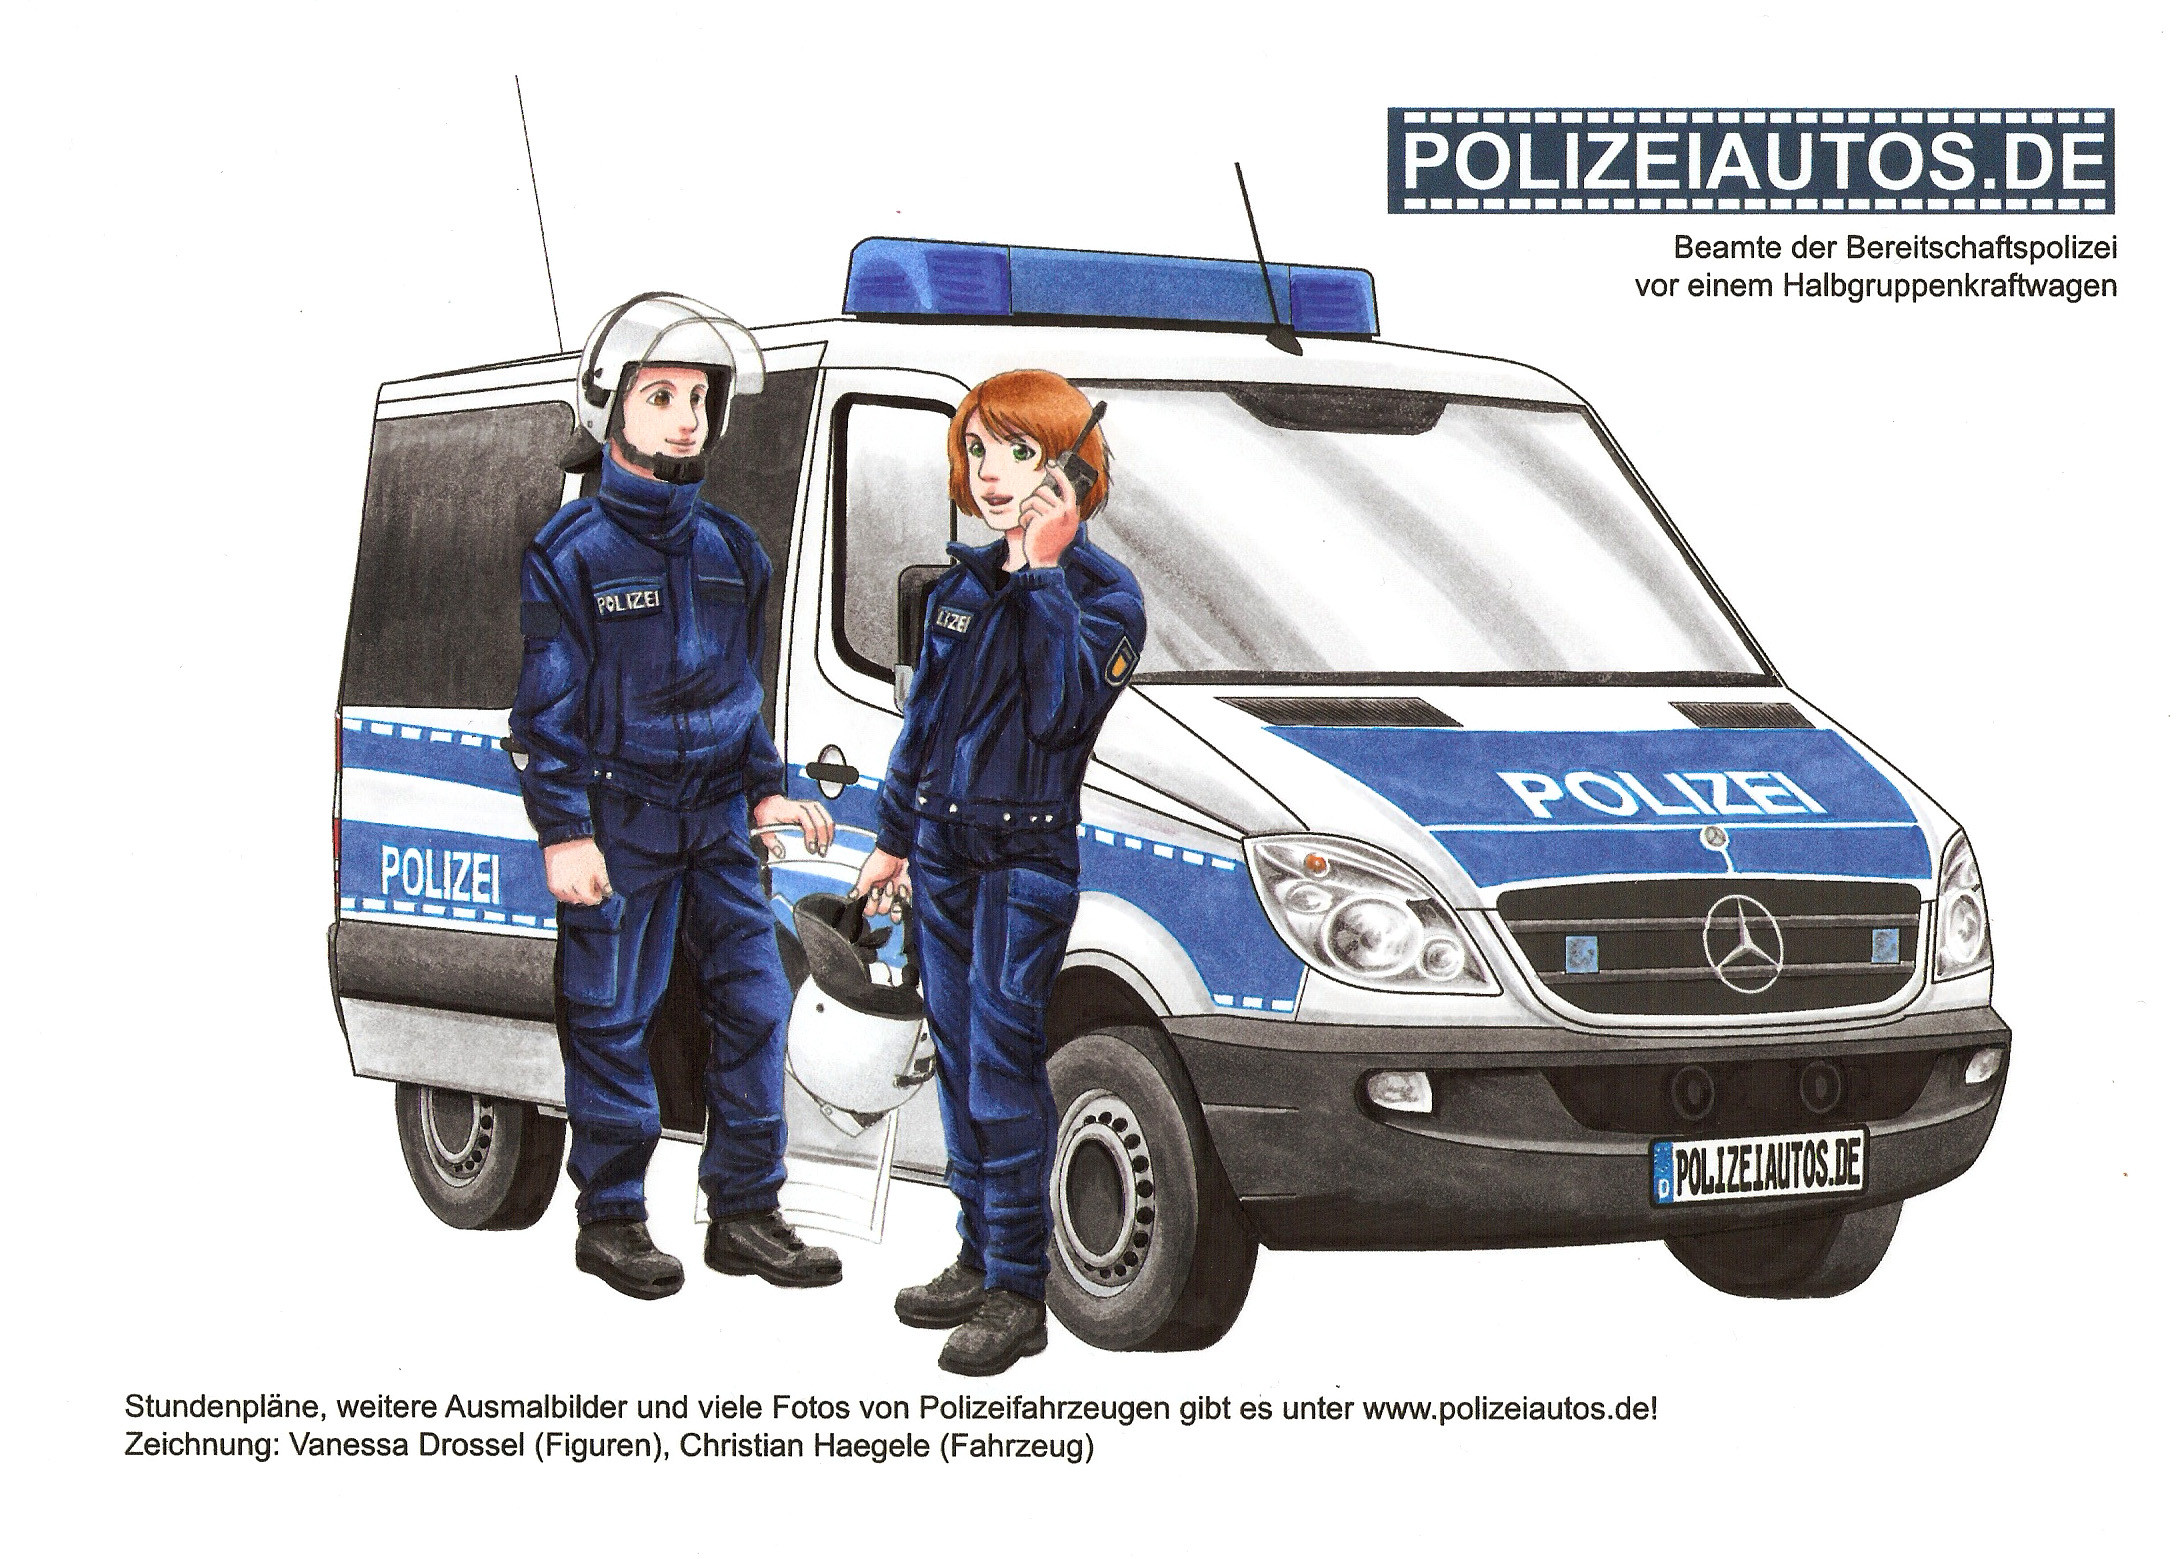 ausmalbilder polizei neu der polizei ekasapta me neu